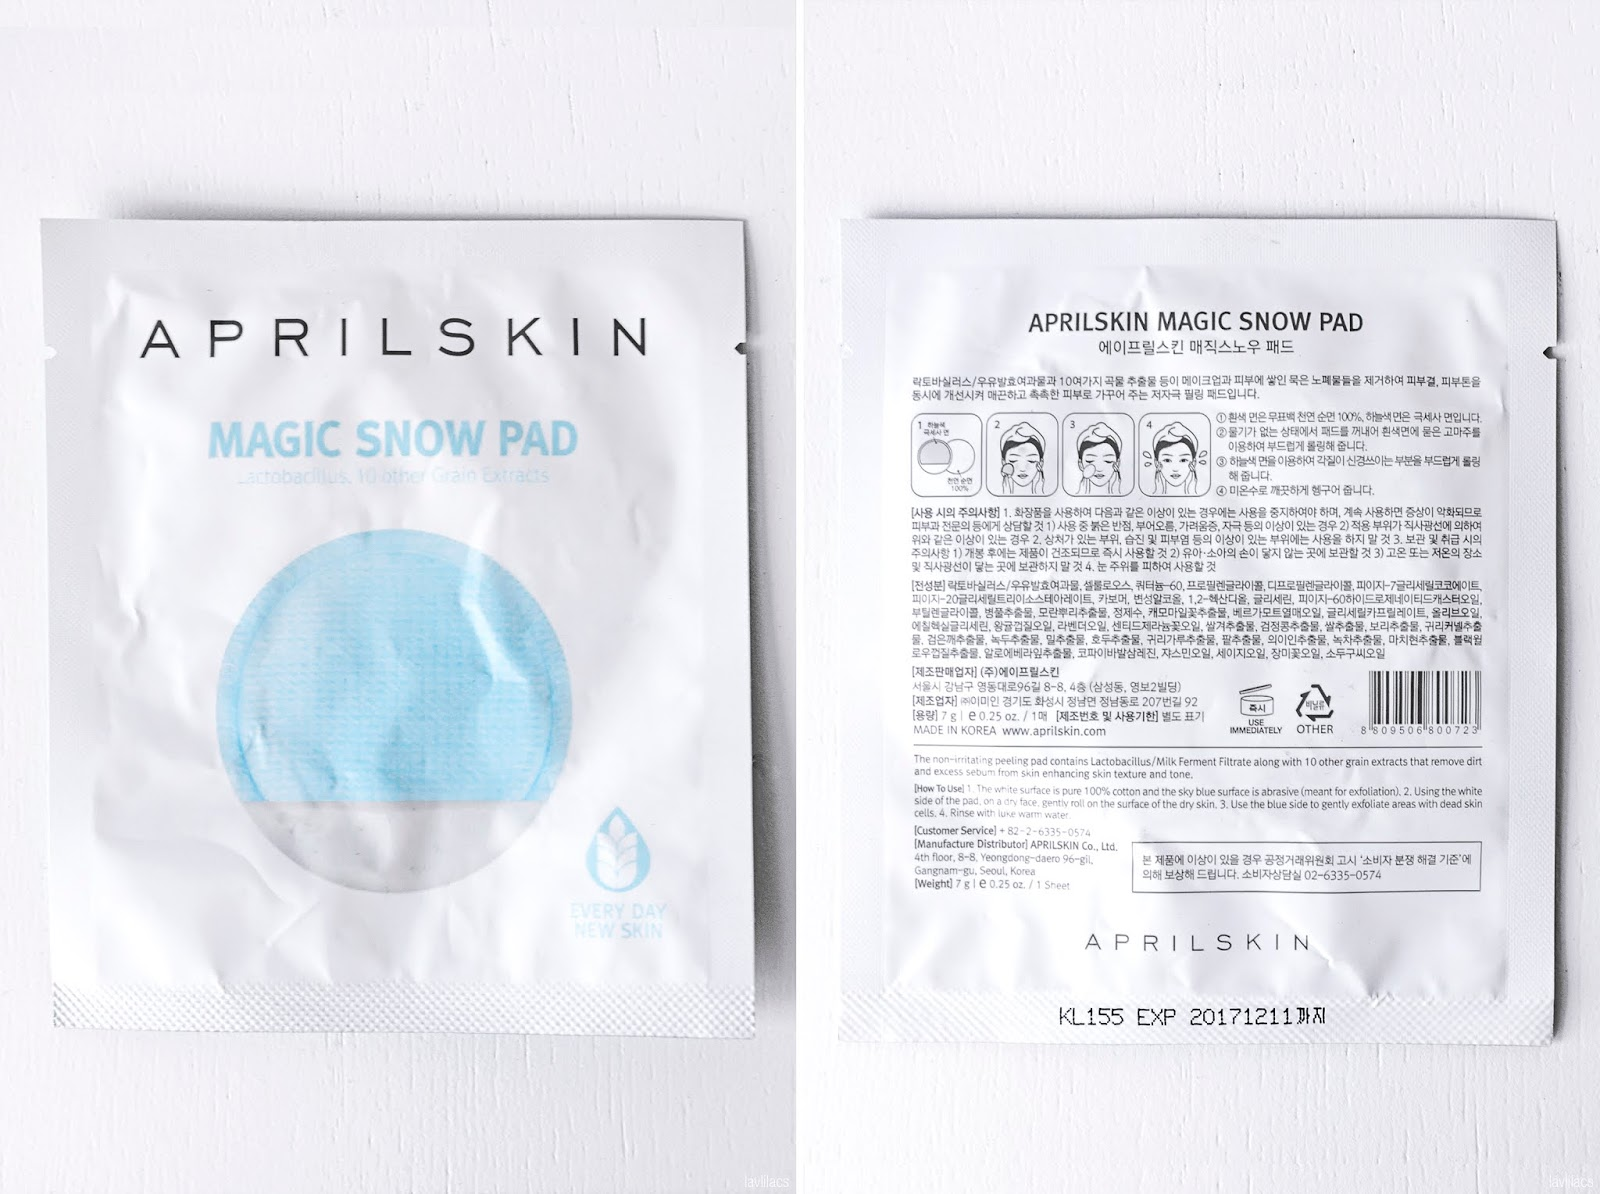 lavlilacs AprilSkin Magic Snow Pad packaging